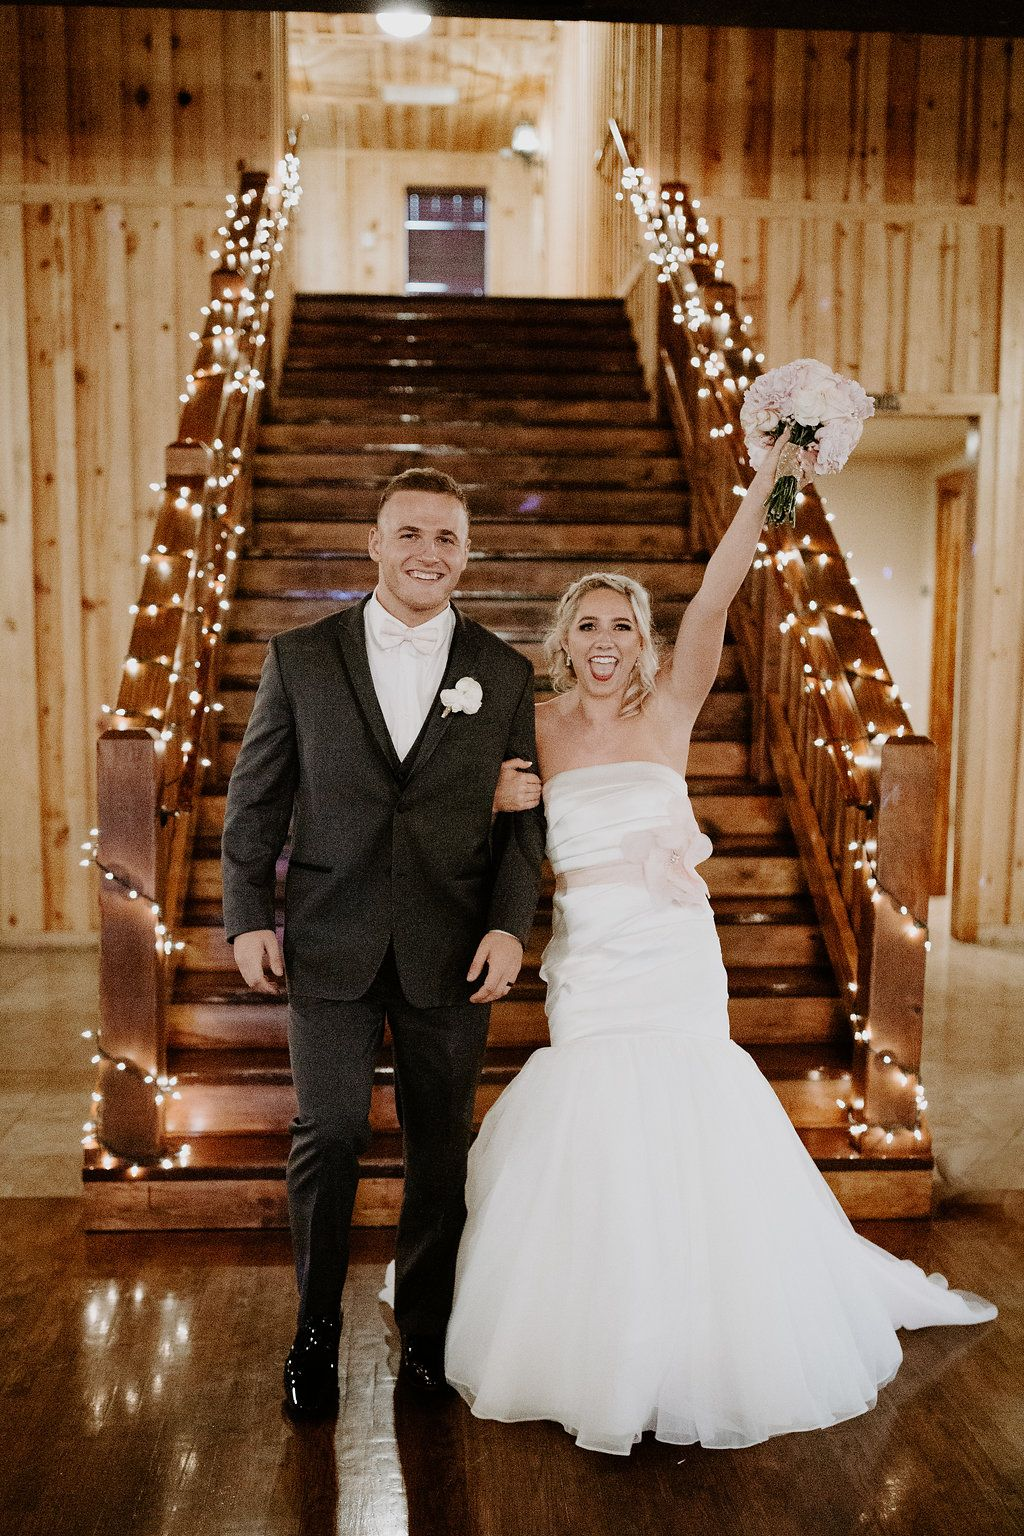 Oklahoma City Wedding Venue In Edmond City Wedding Venues Wedding Photos Rustic Modern Wedding